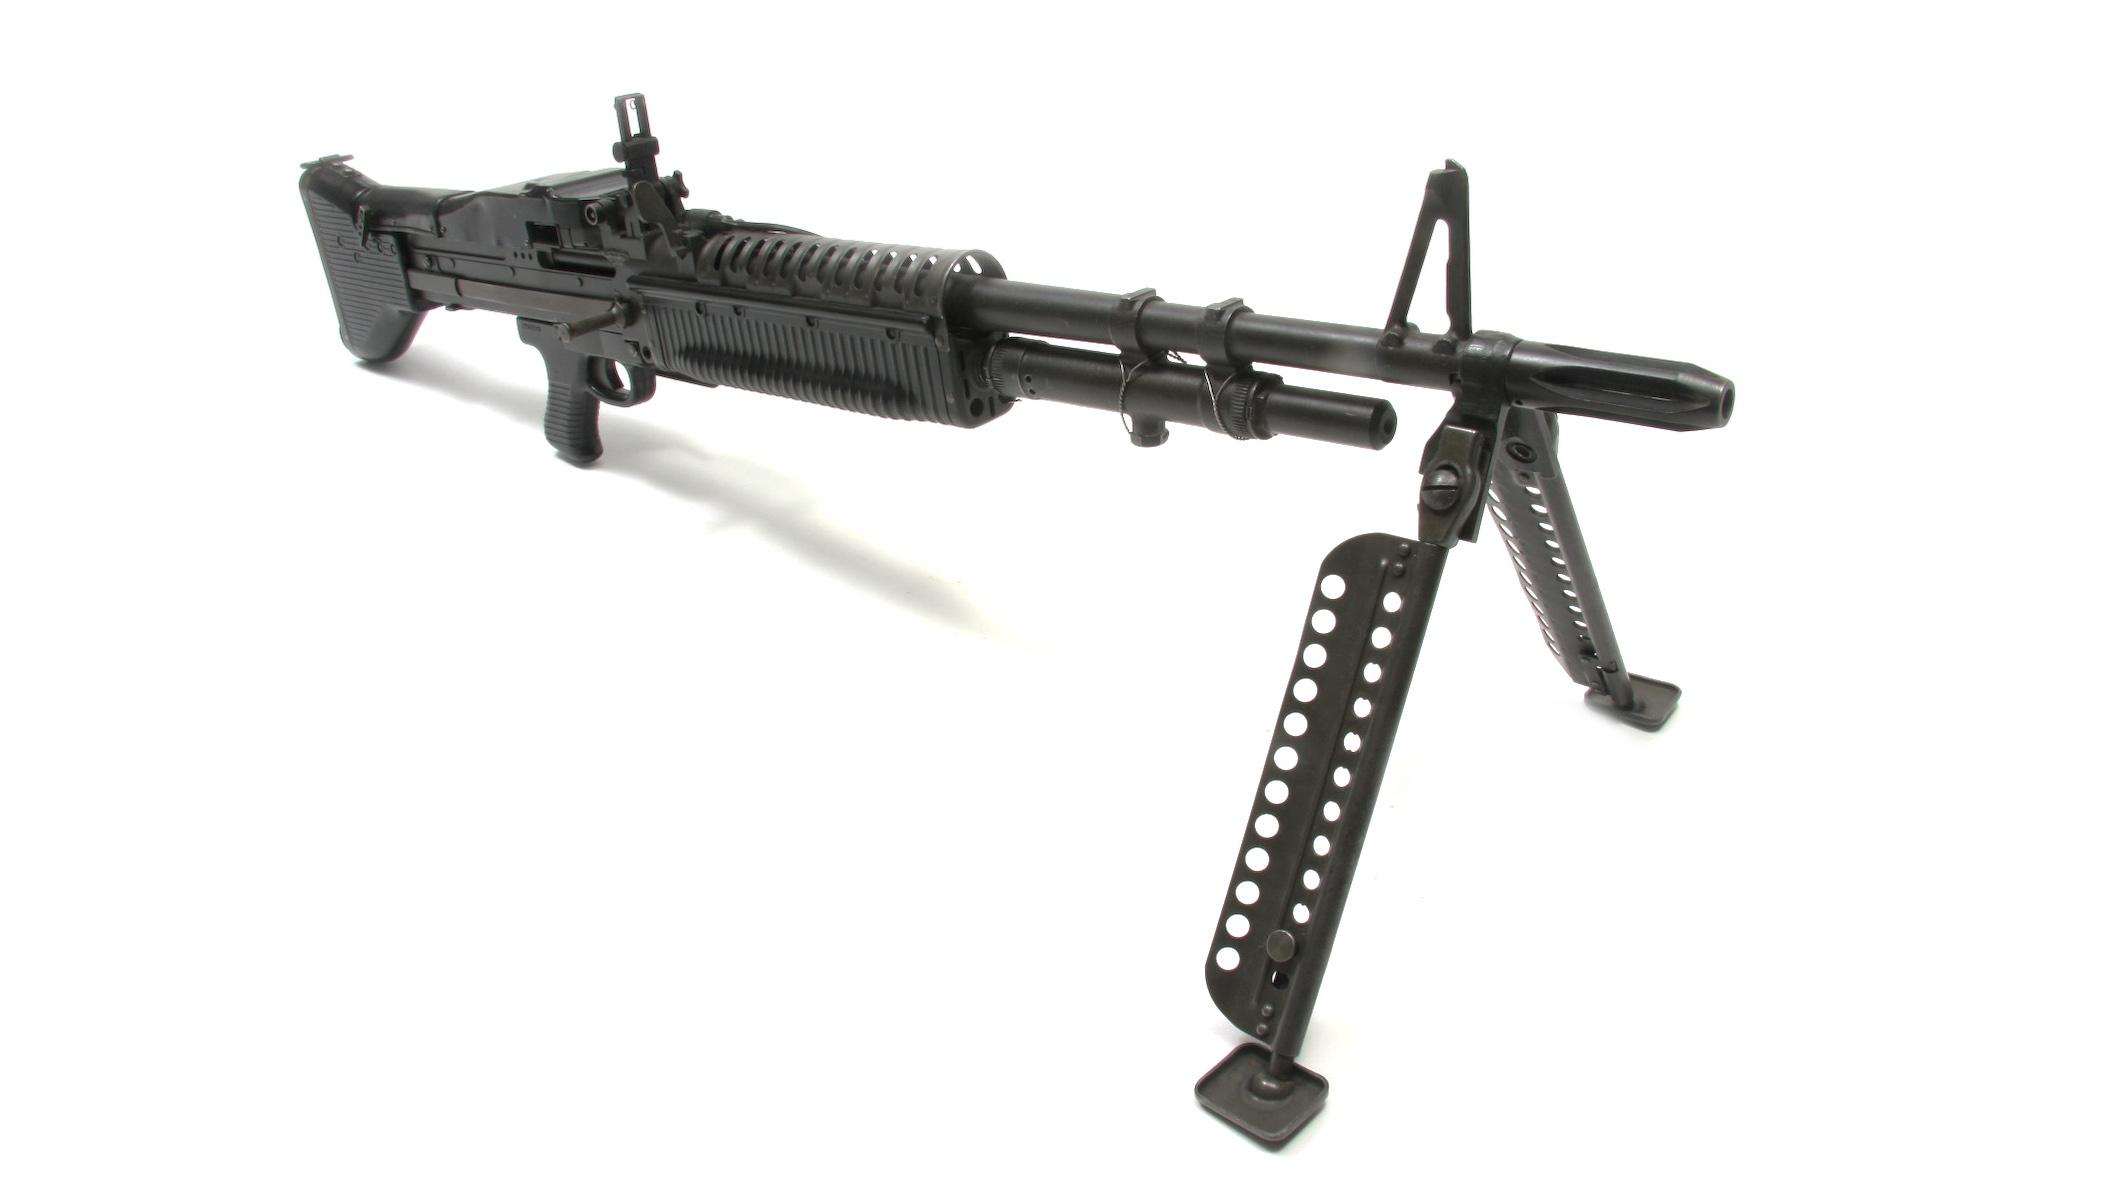 m60 machine gun - photo #20